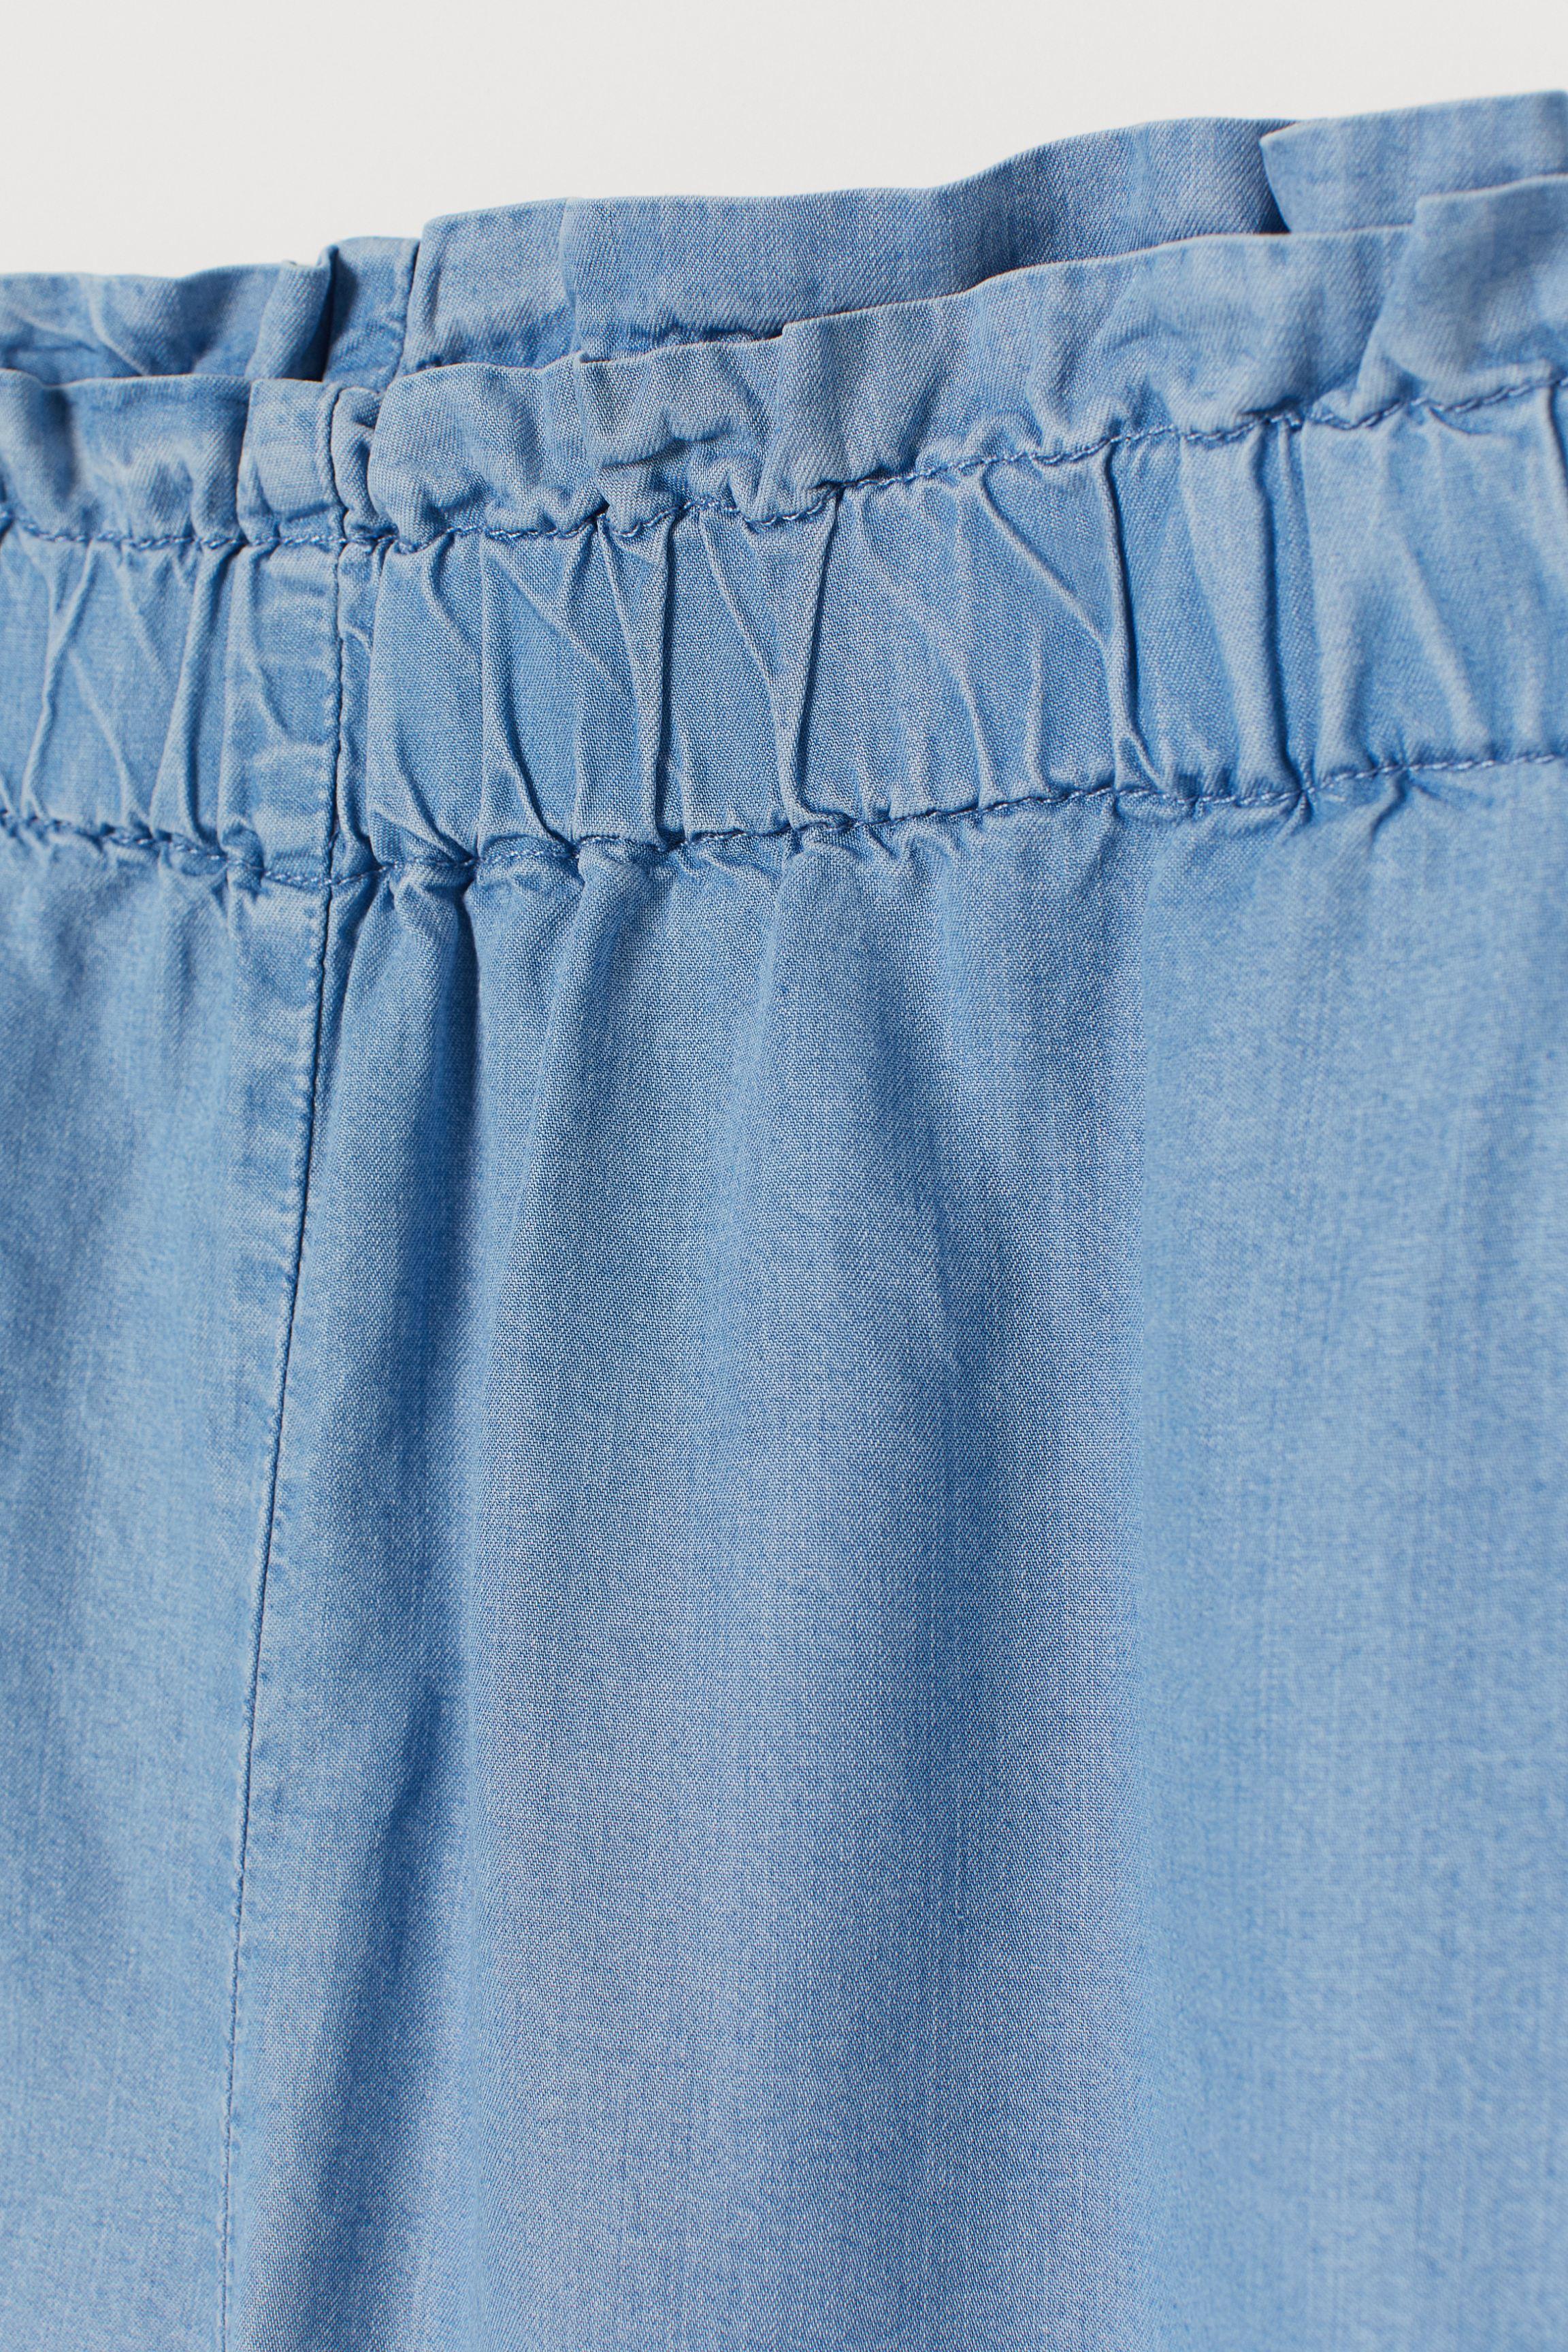 H&M+ Pull-on Lyocell Shorts